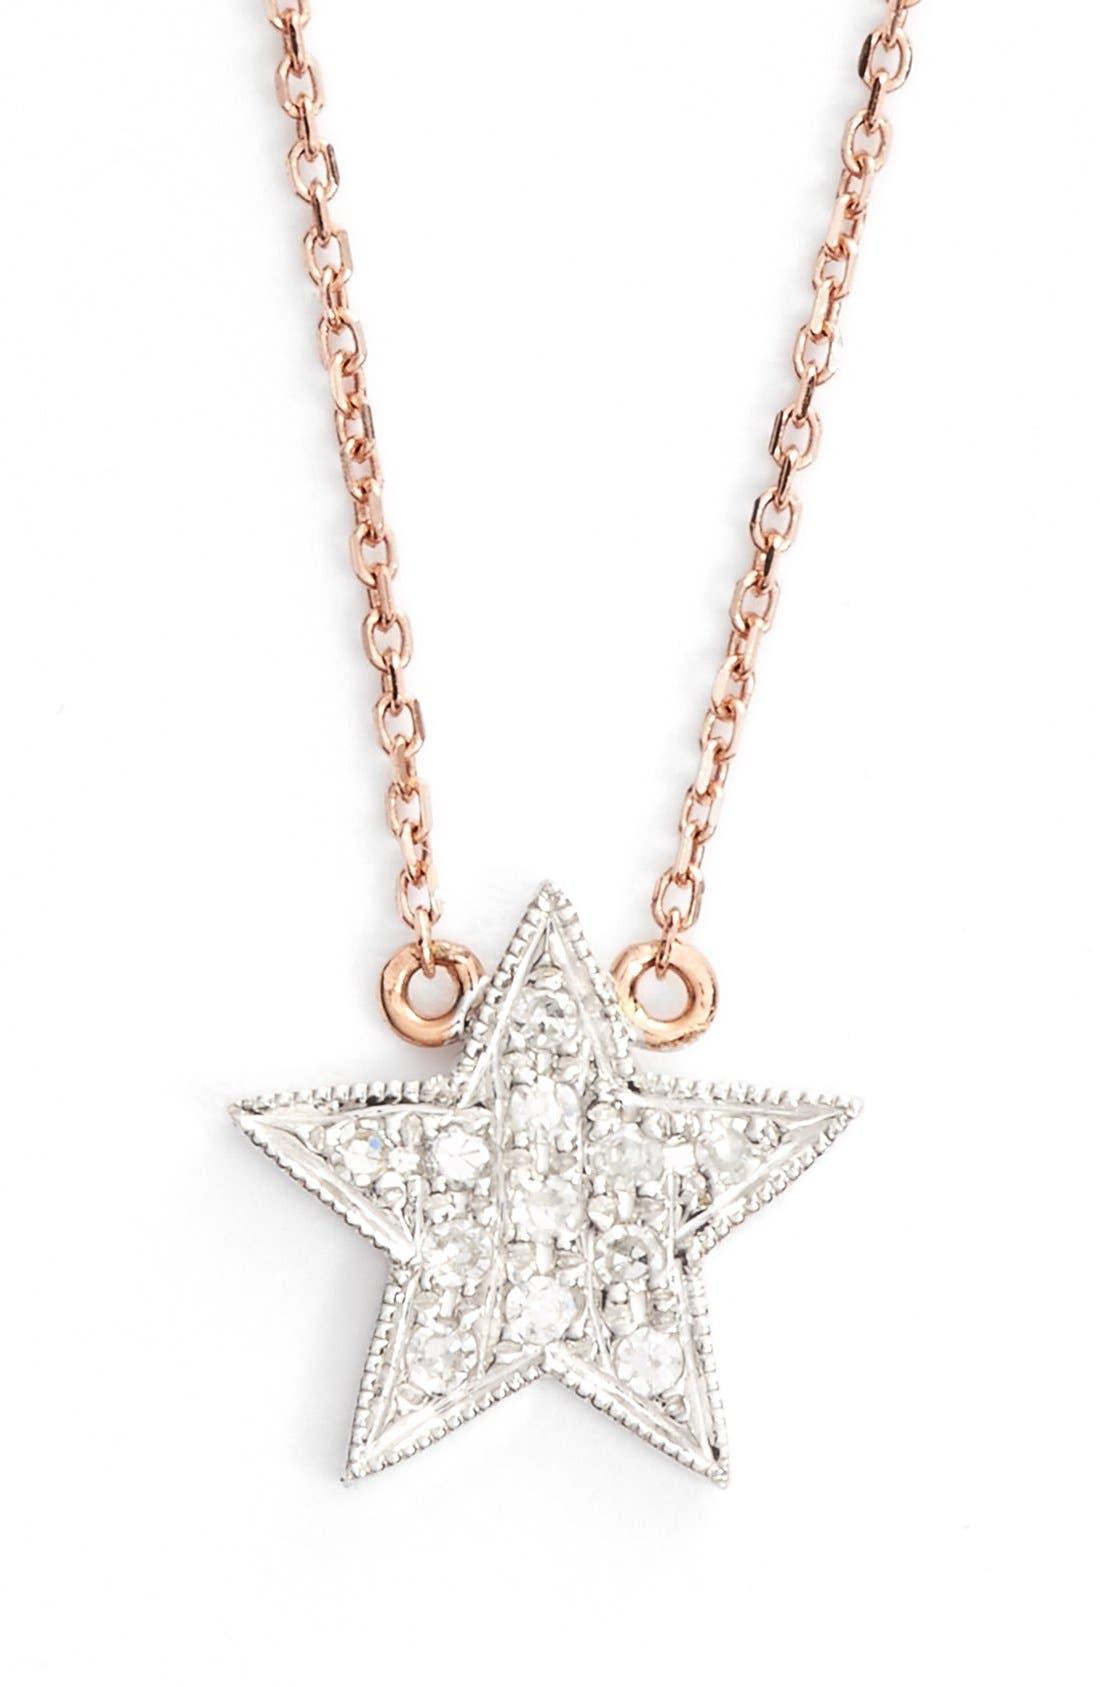 DANA REBECCA DESIGNS 'Julianne Himiko' Diamond Star Pendant